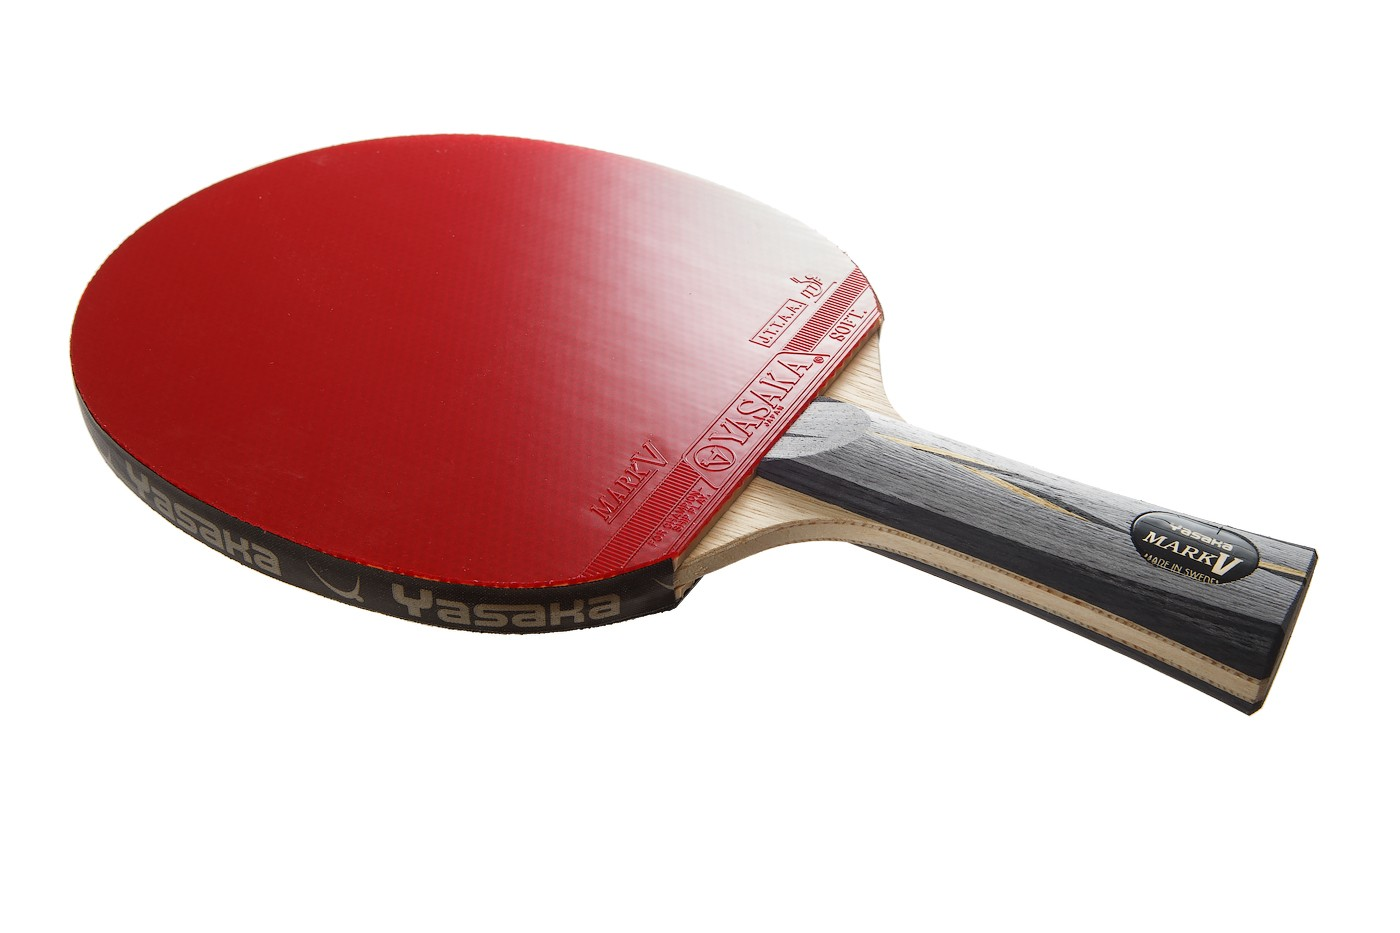 YASAKA Mark V Table Tennis Rubber